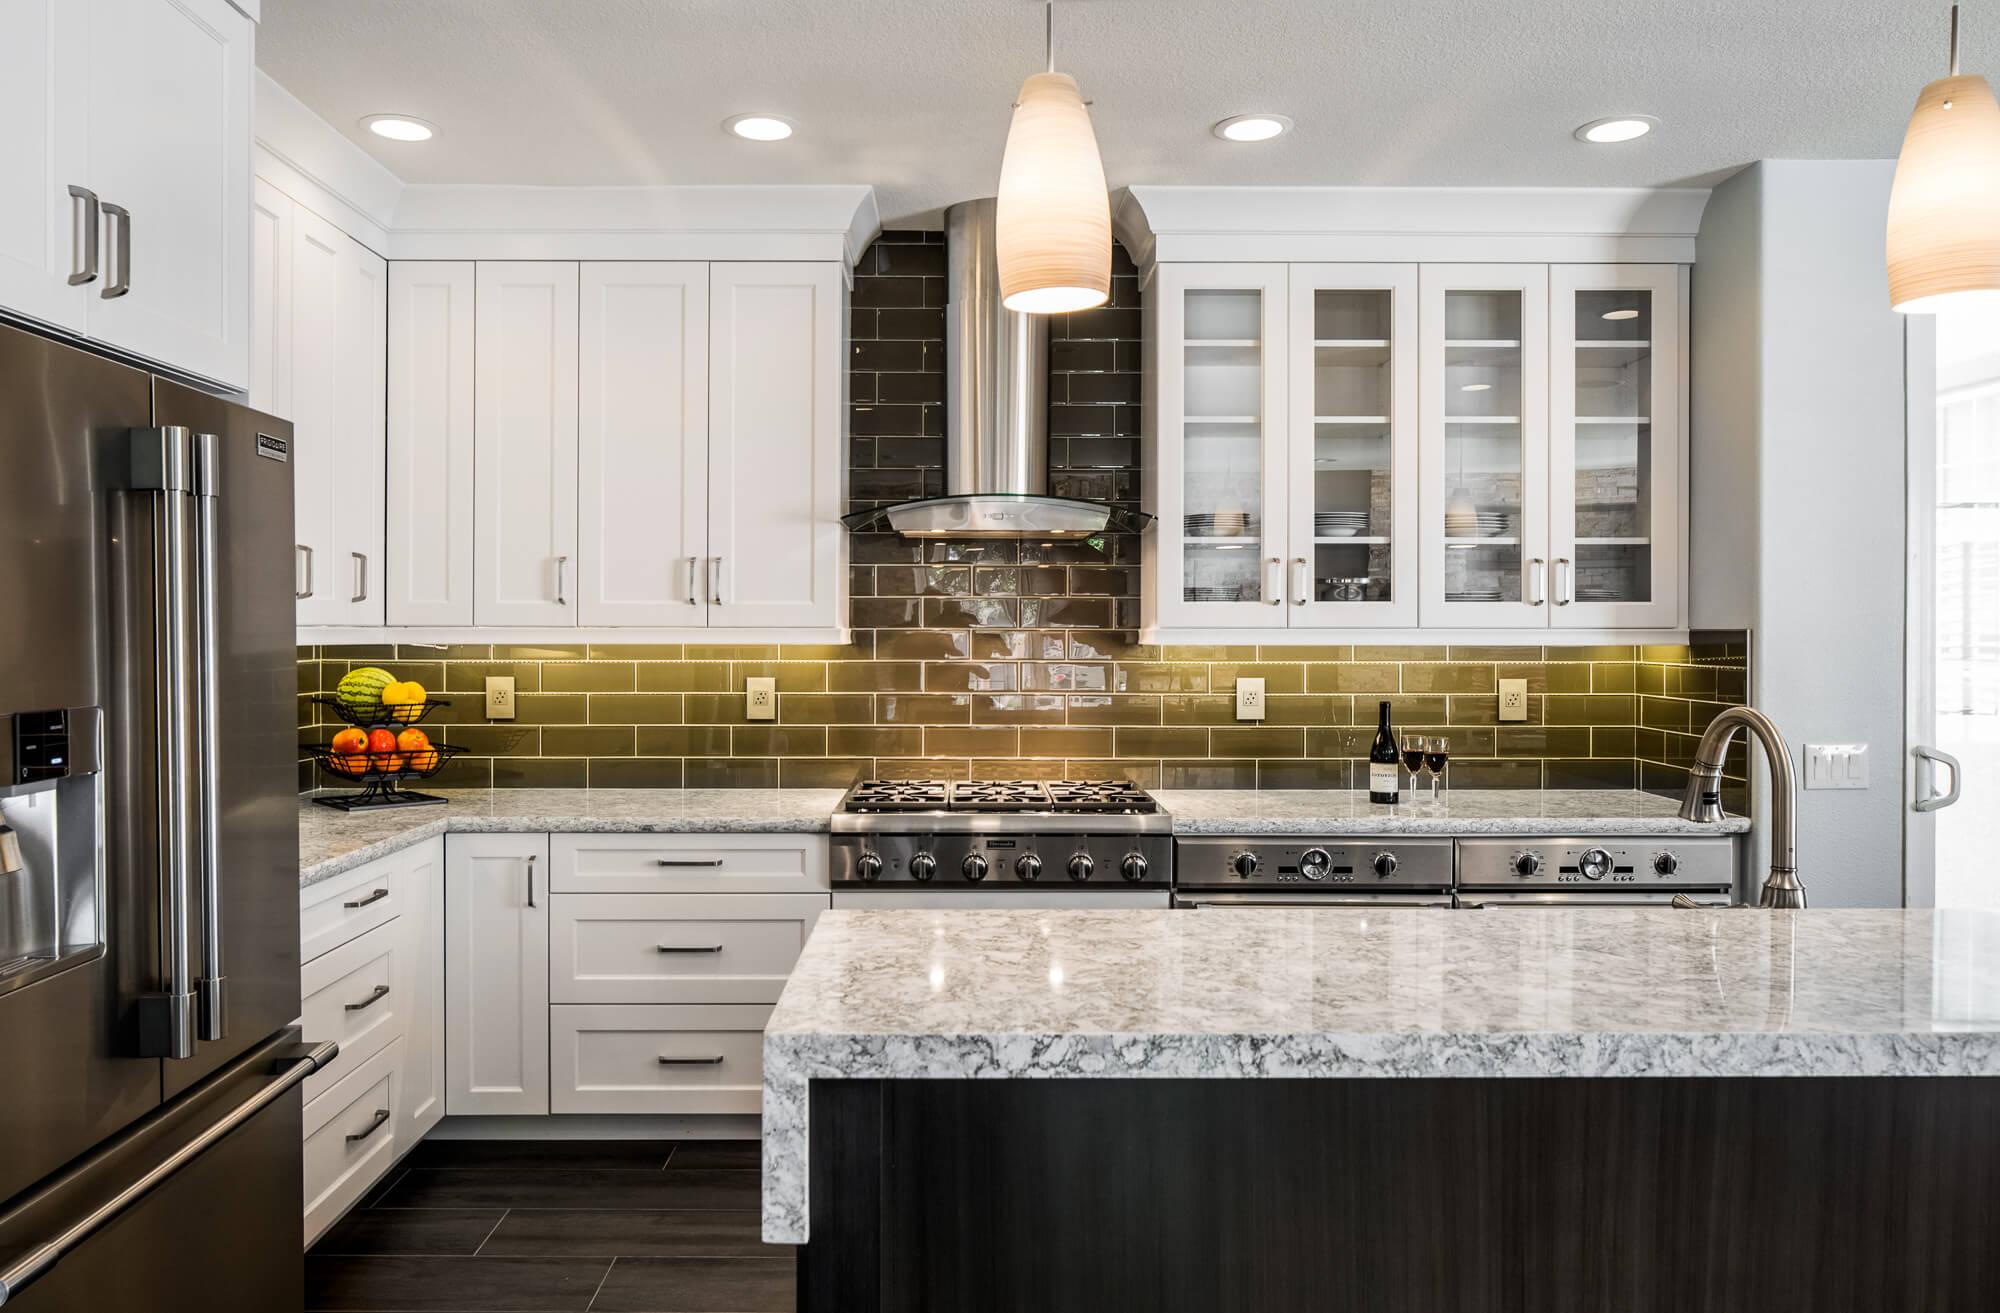 Green Backsplash with White Countertop, Unique Kitchen Design, White Kitchen Cabinets with Green Back Splash